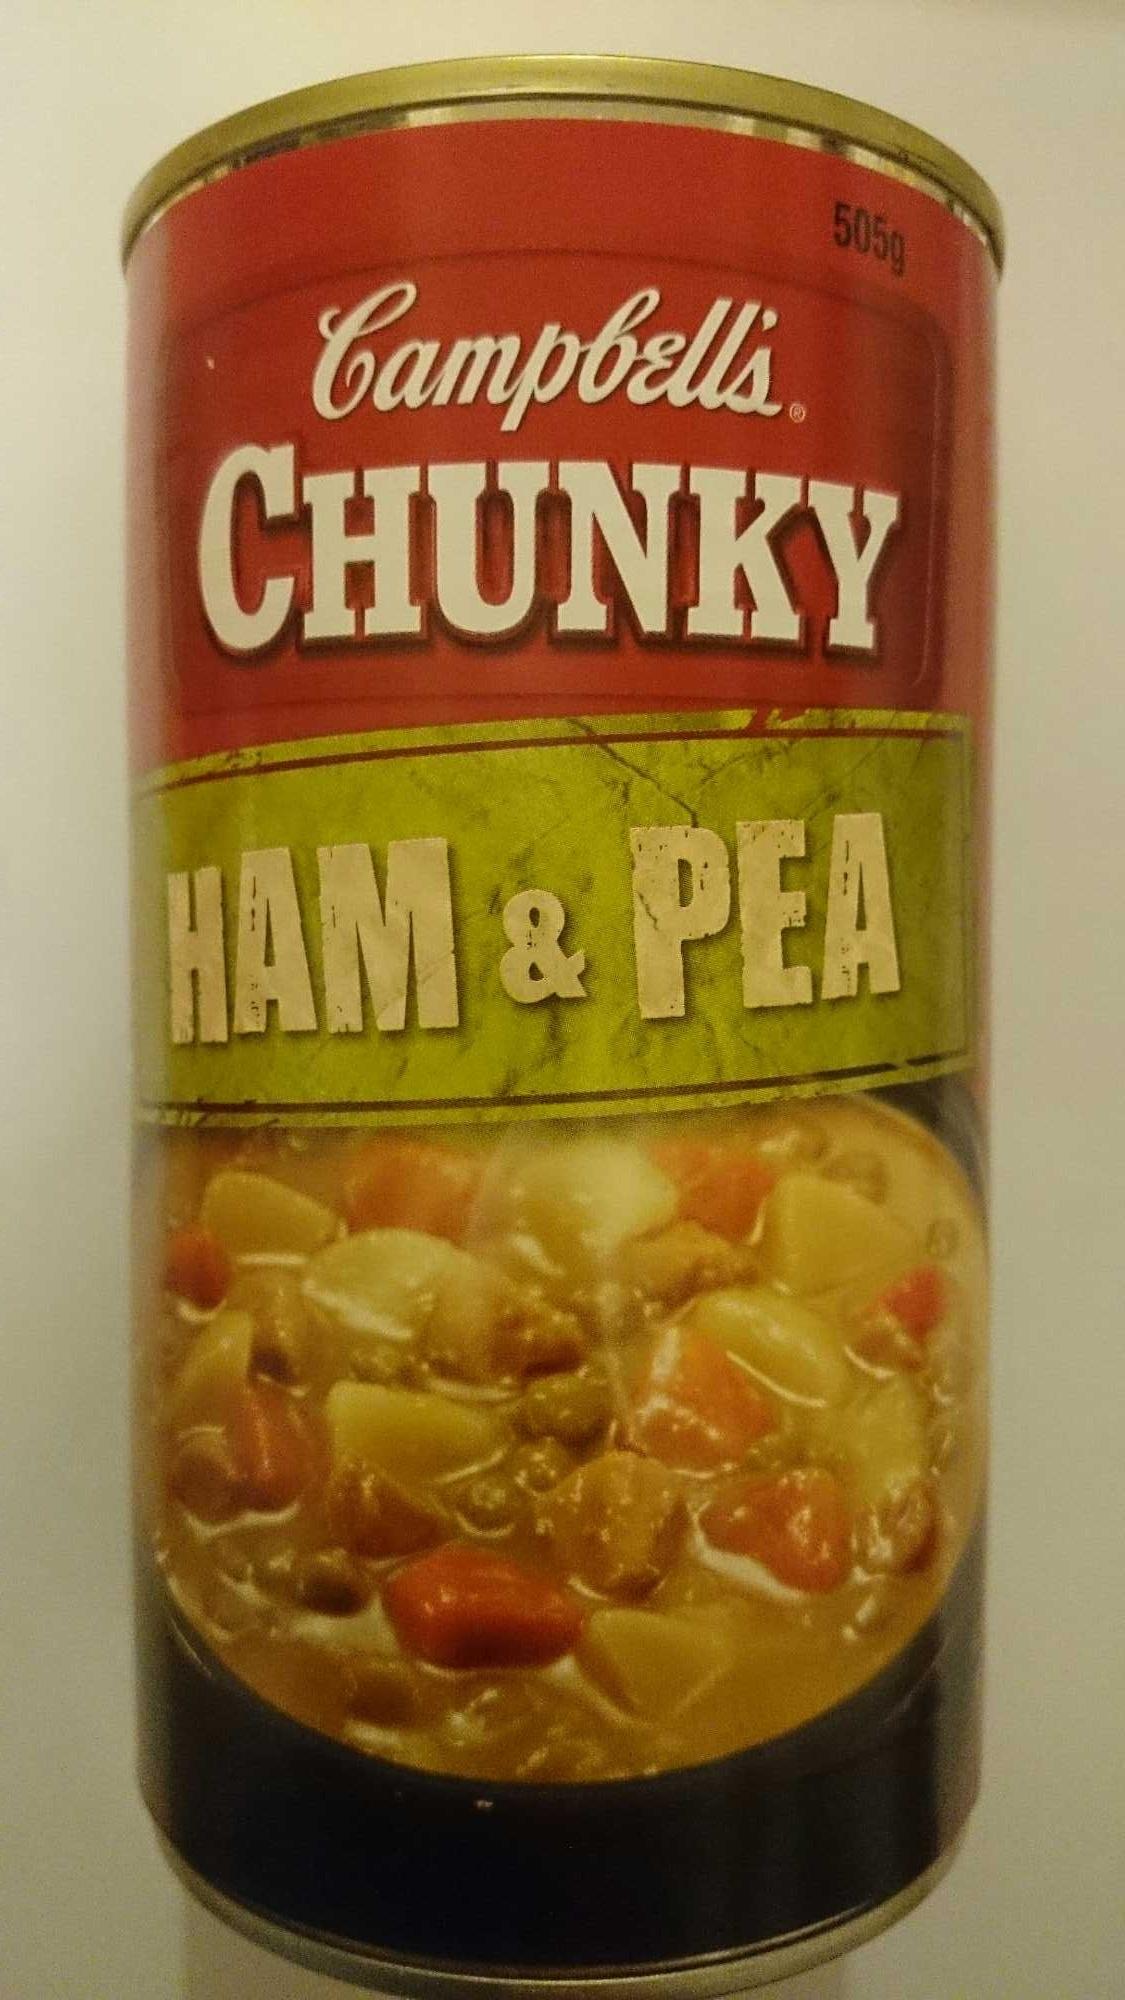 Chunky ham & pea - Product - en